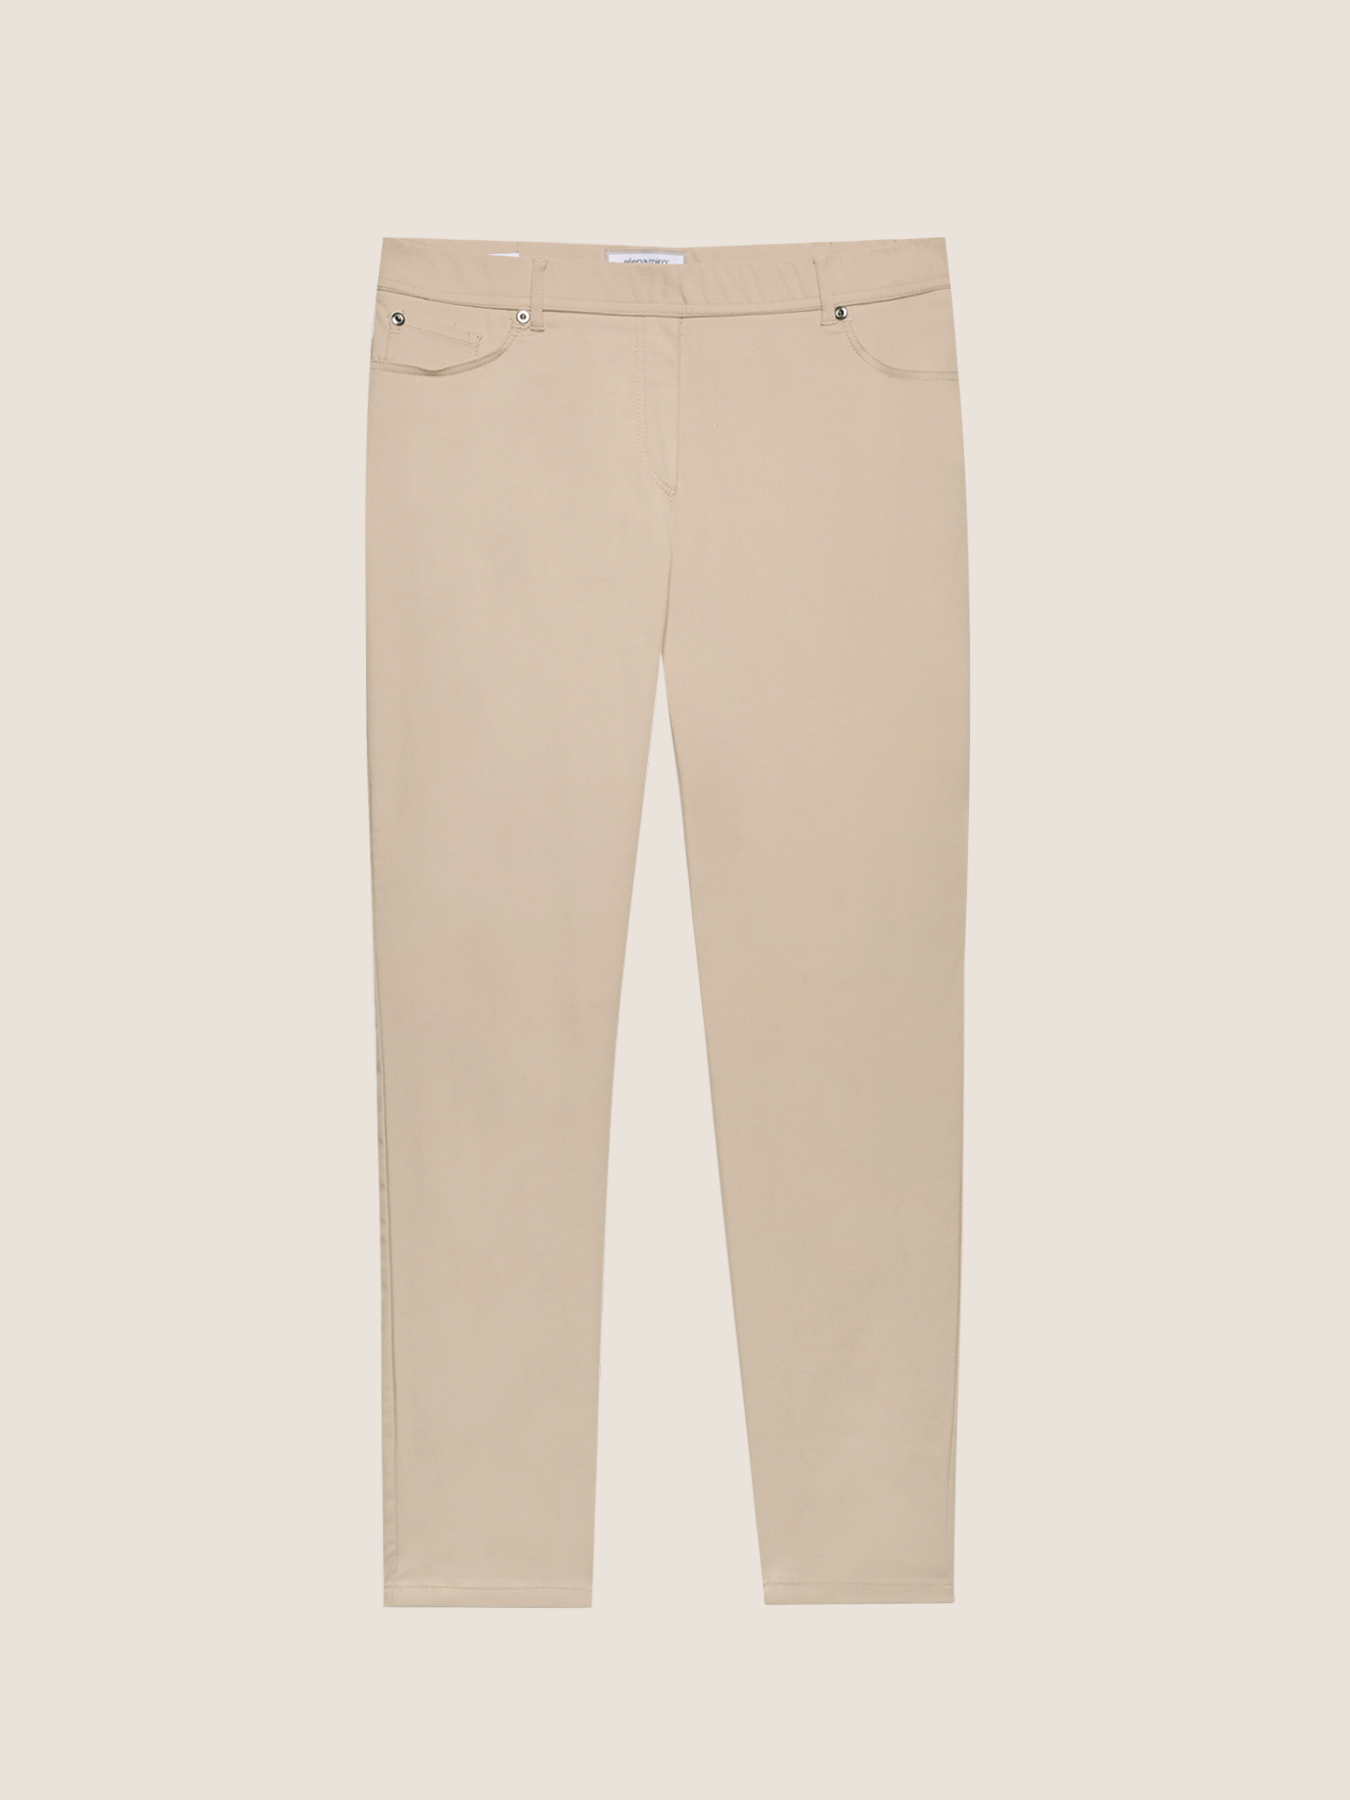 ELENA MIRO' | Trousers Conformed | P800L0138502